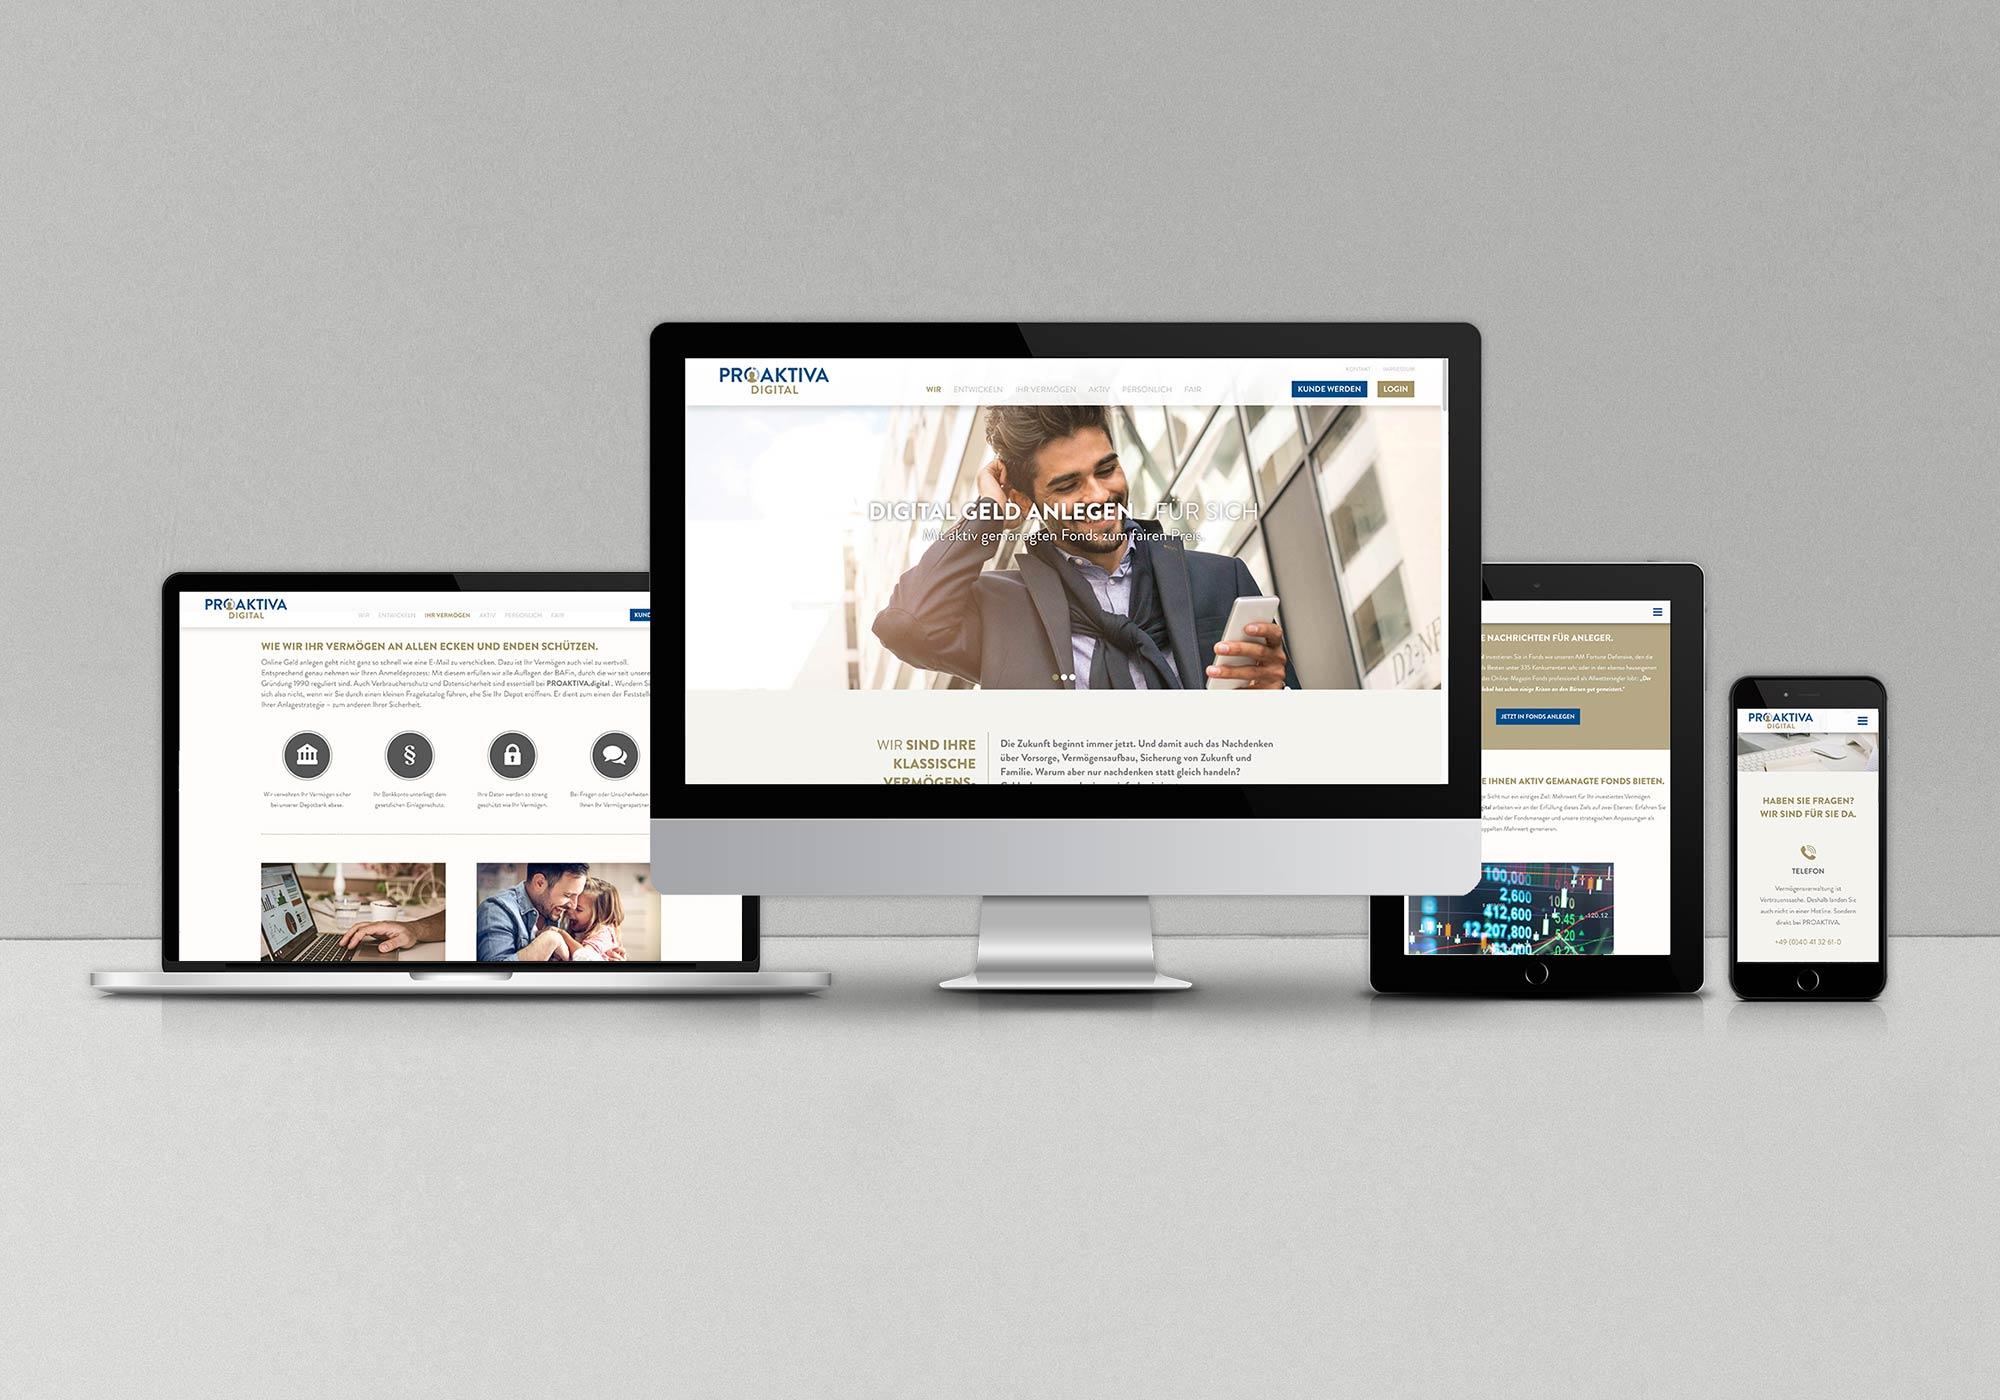 001_PA_Digital_Website